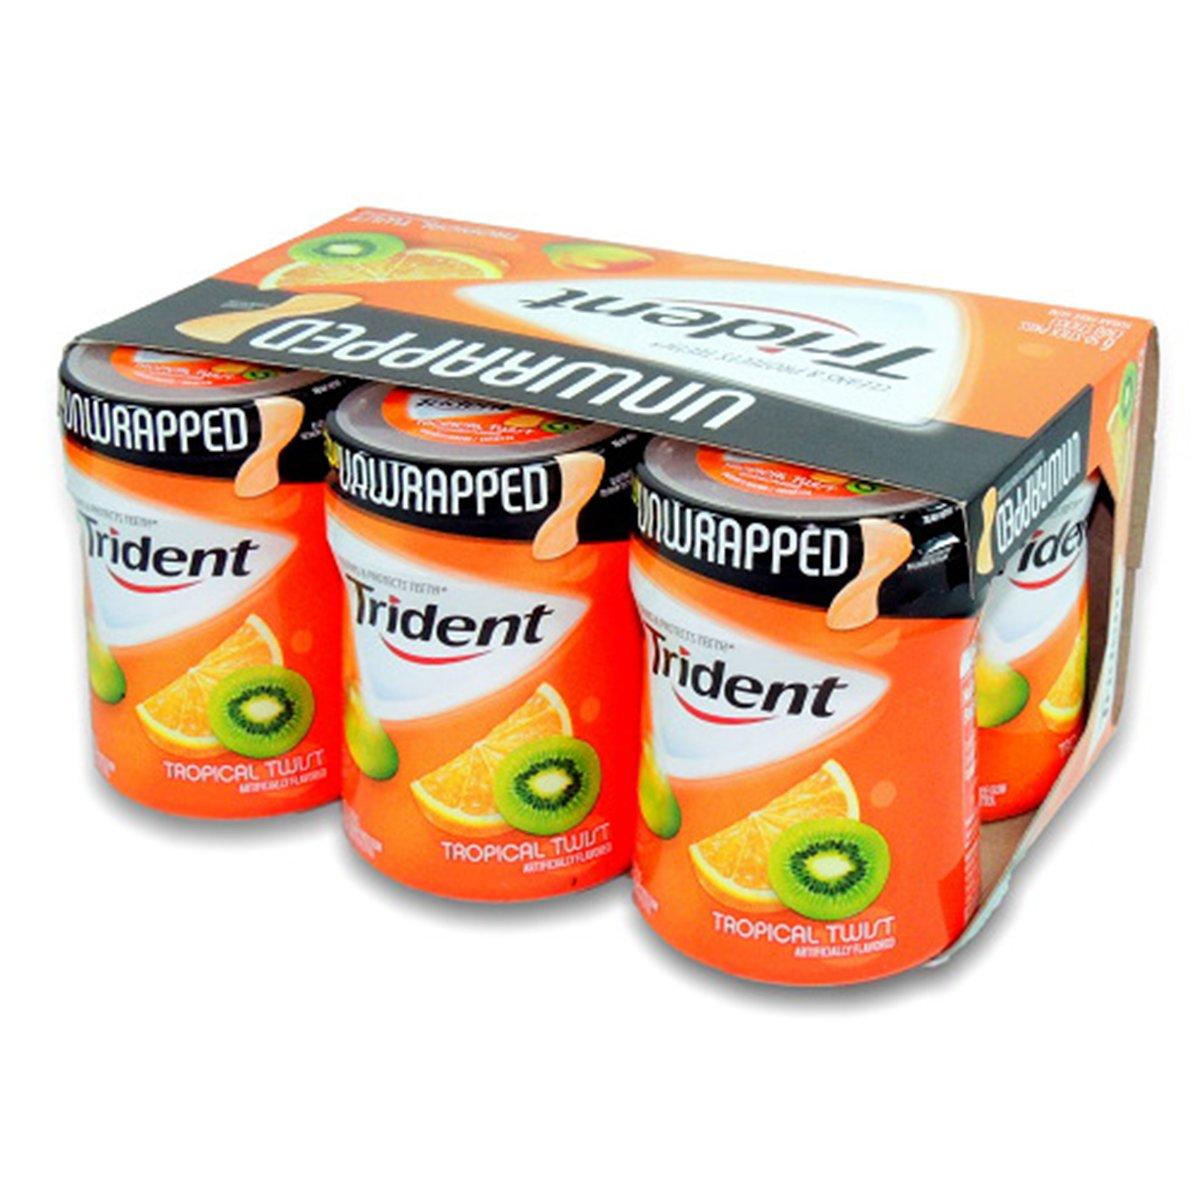 Product Of Trident, Gum Tropical Twist - Bottle, Count 6 (50Stks) - Gum / Grab Varieties & Flavors